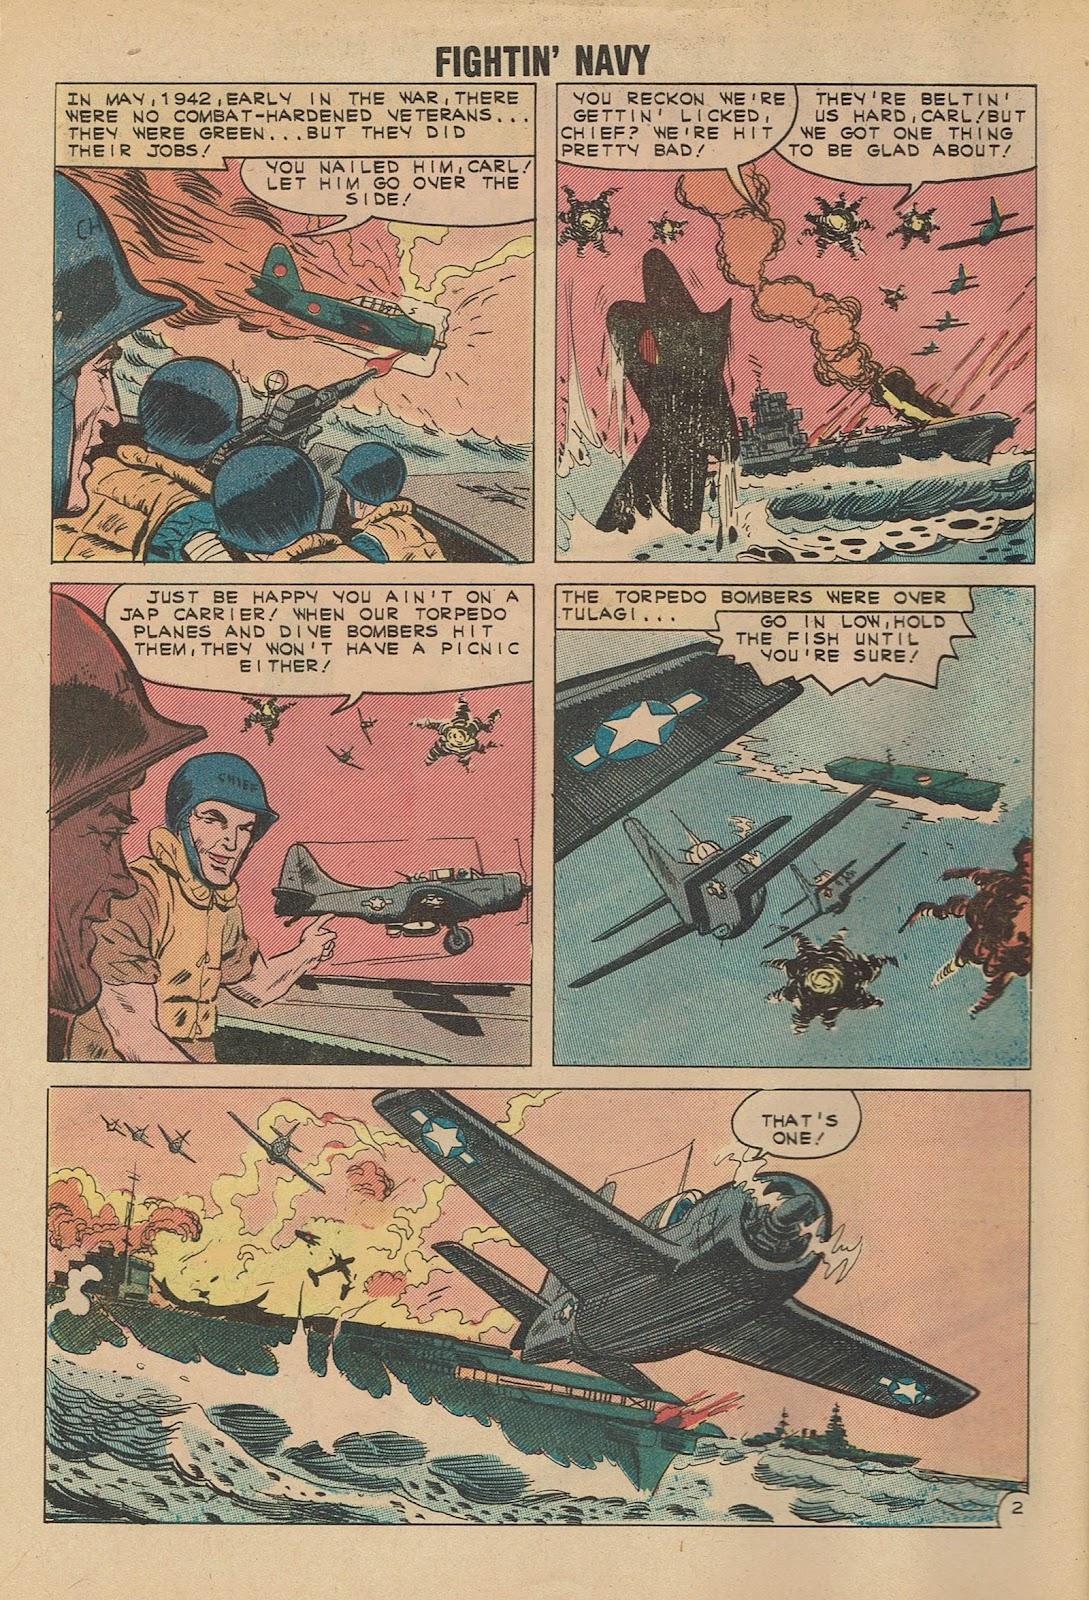 Read online Fightin' Navy comic -  Issue #101 - 4